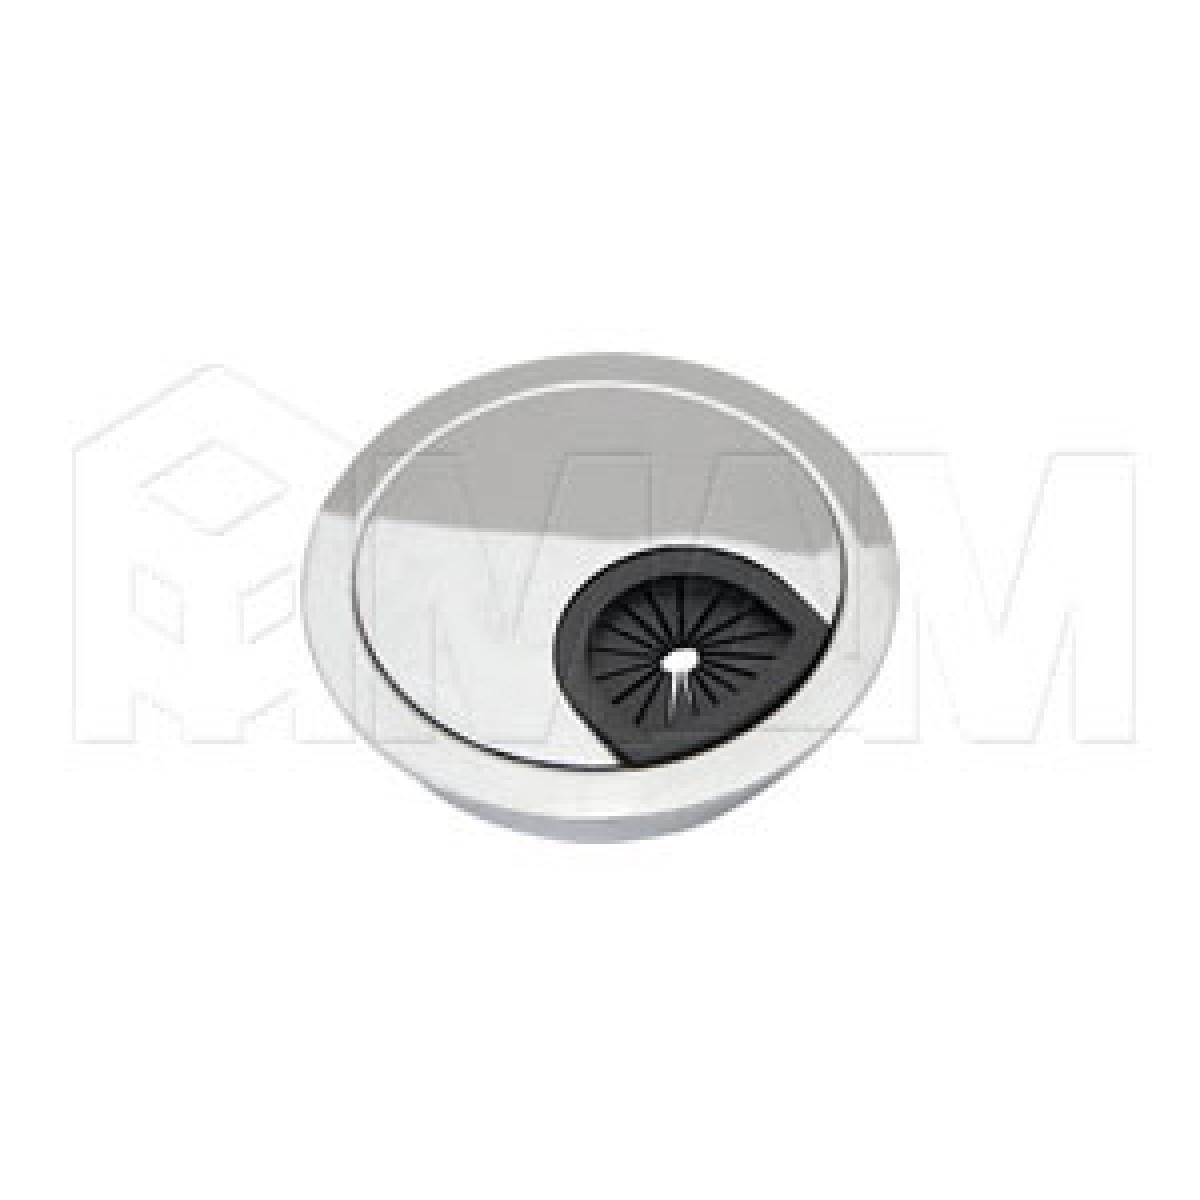 Заглушка кабель-канала, металлическая, круглая, d=60 мм, хром